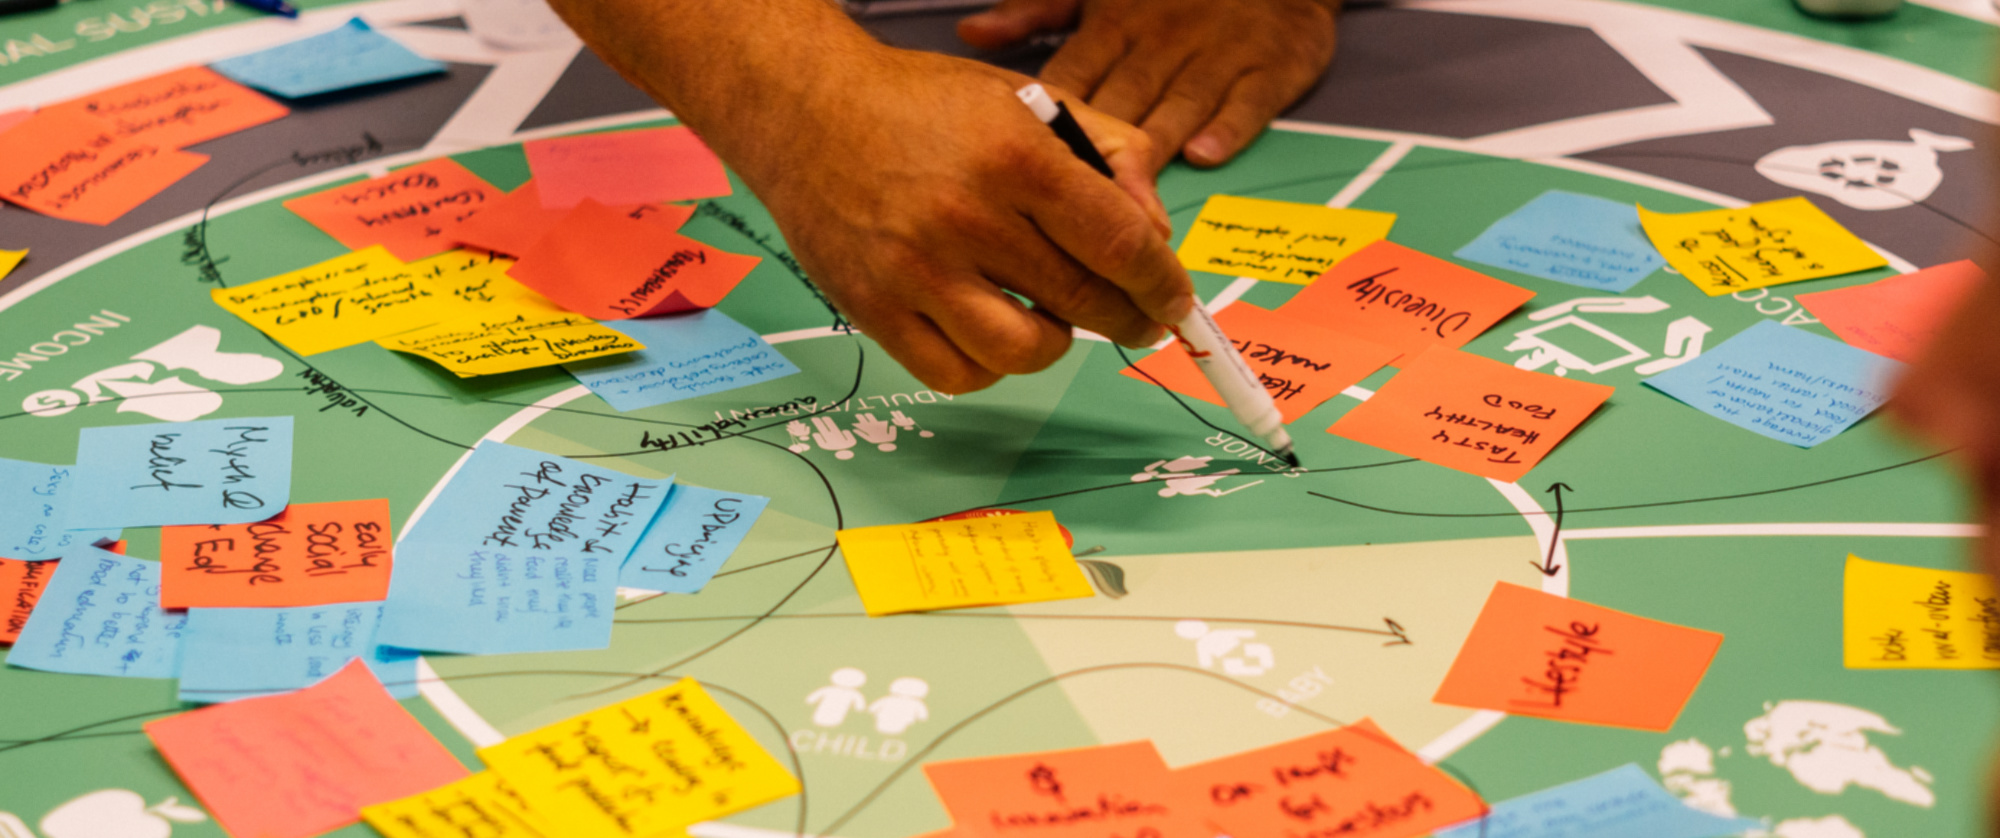 Inside SecondMuse Capital's Future Economy Lab